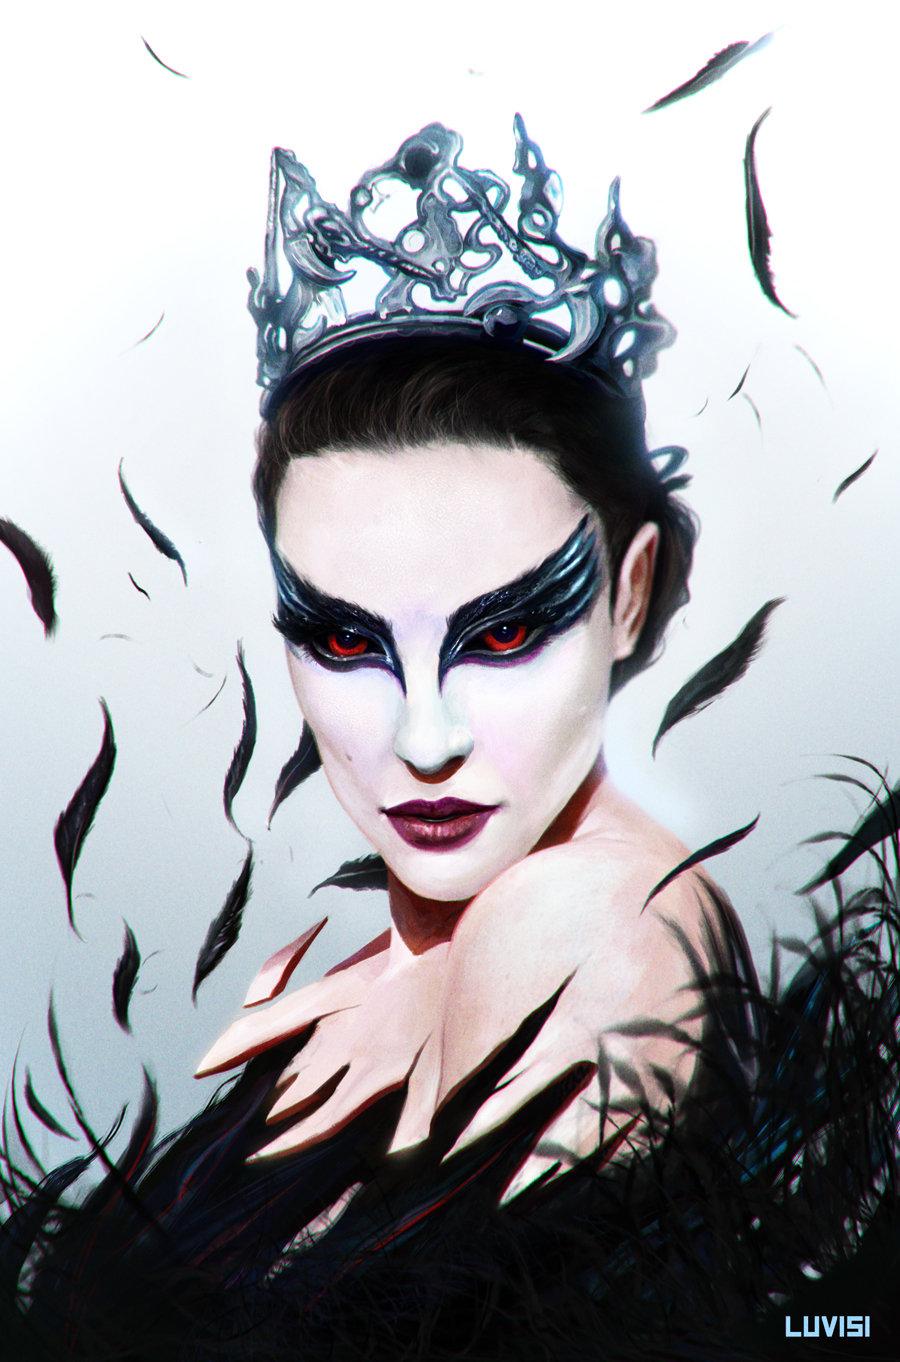 Dan luvisi the black swan by adonihs d3ajfdz 1